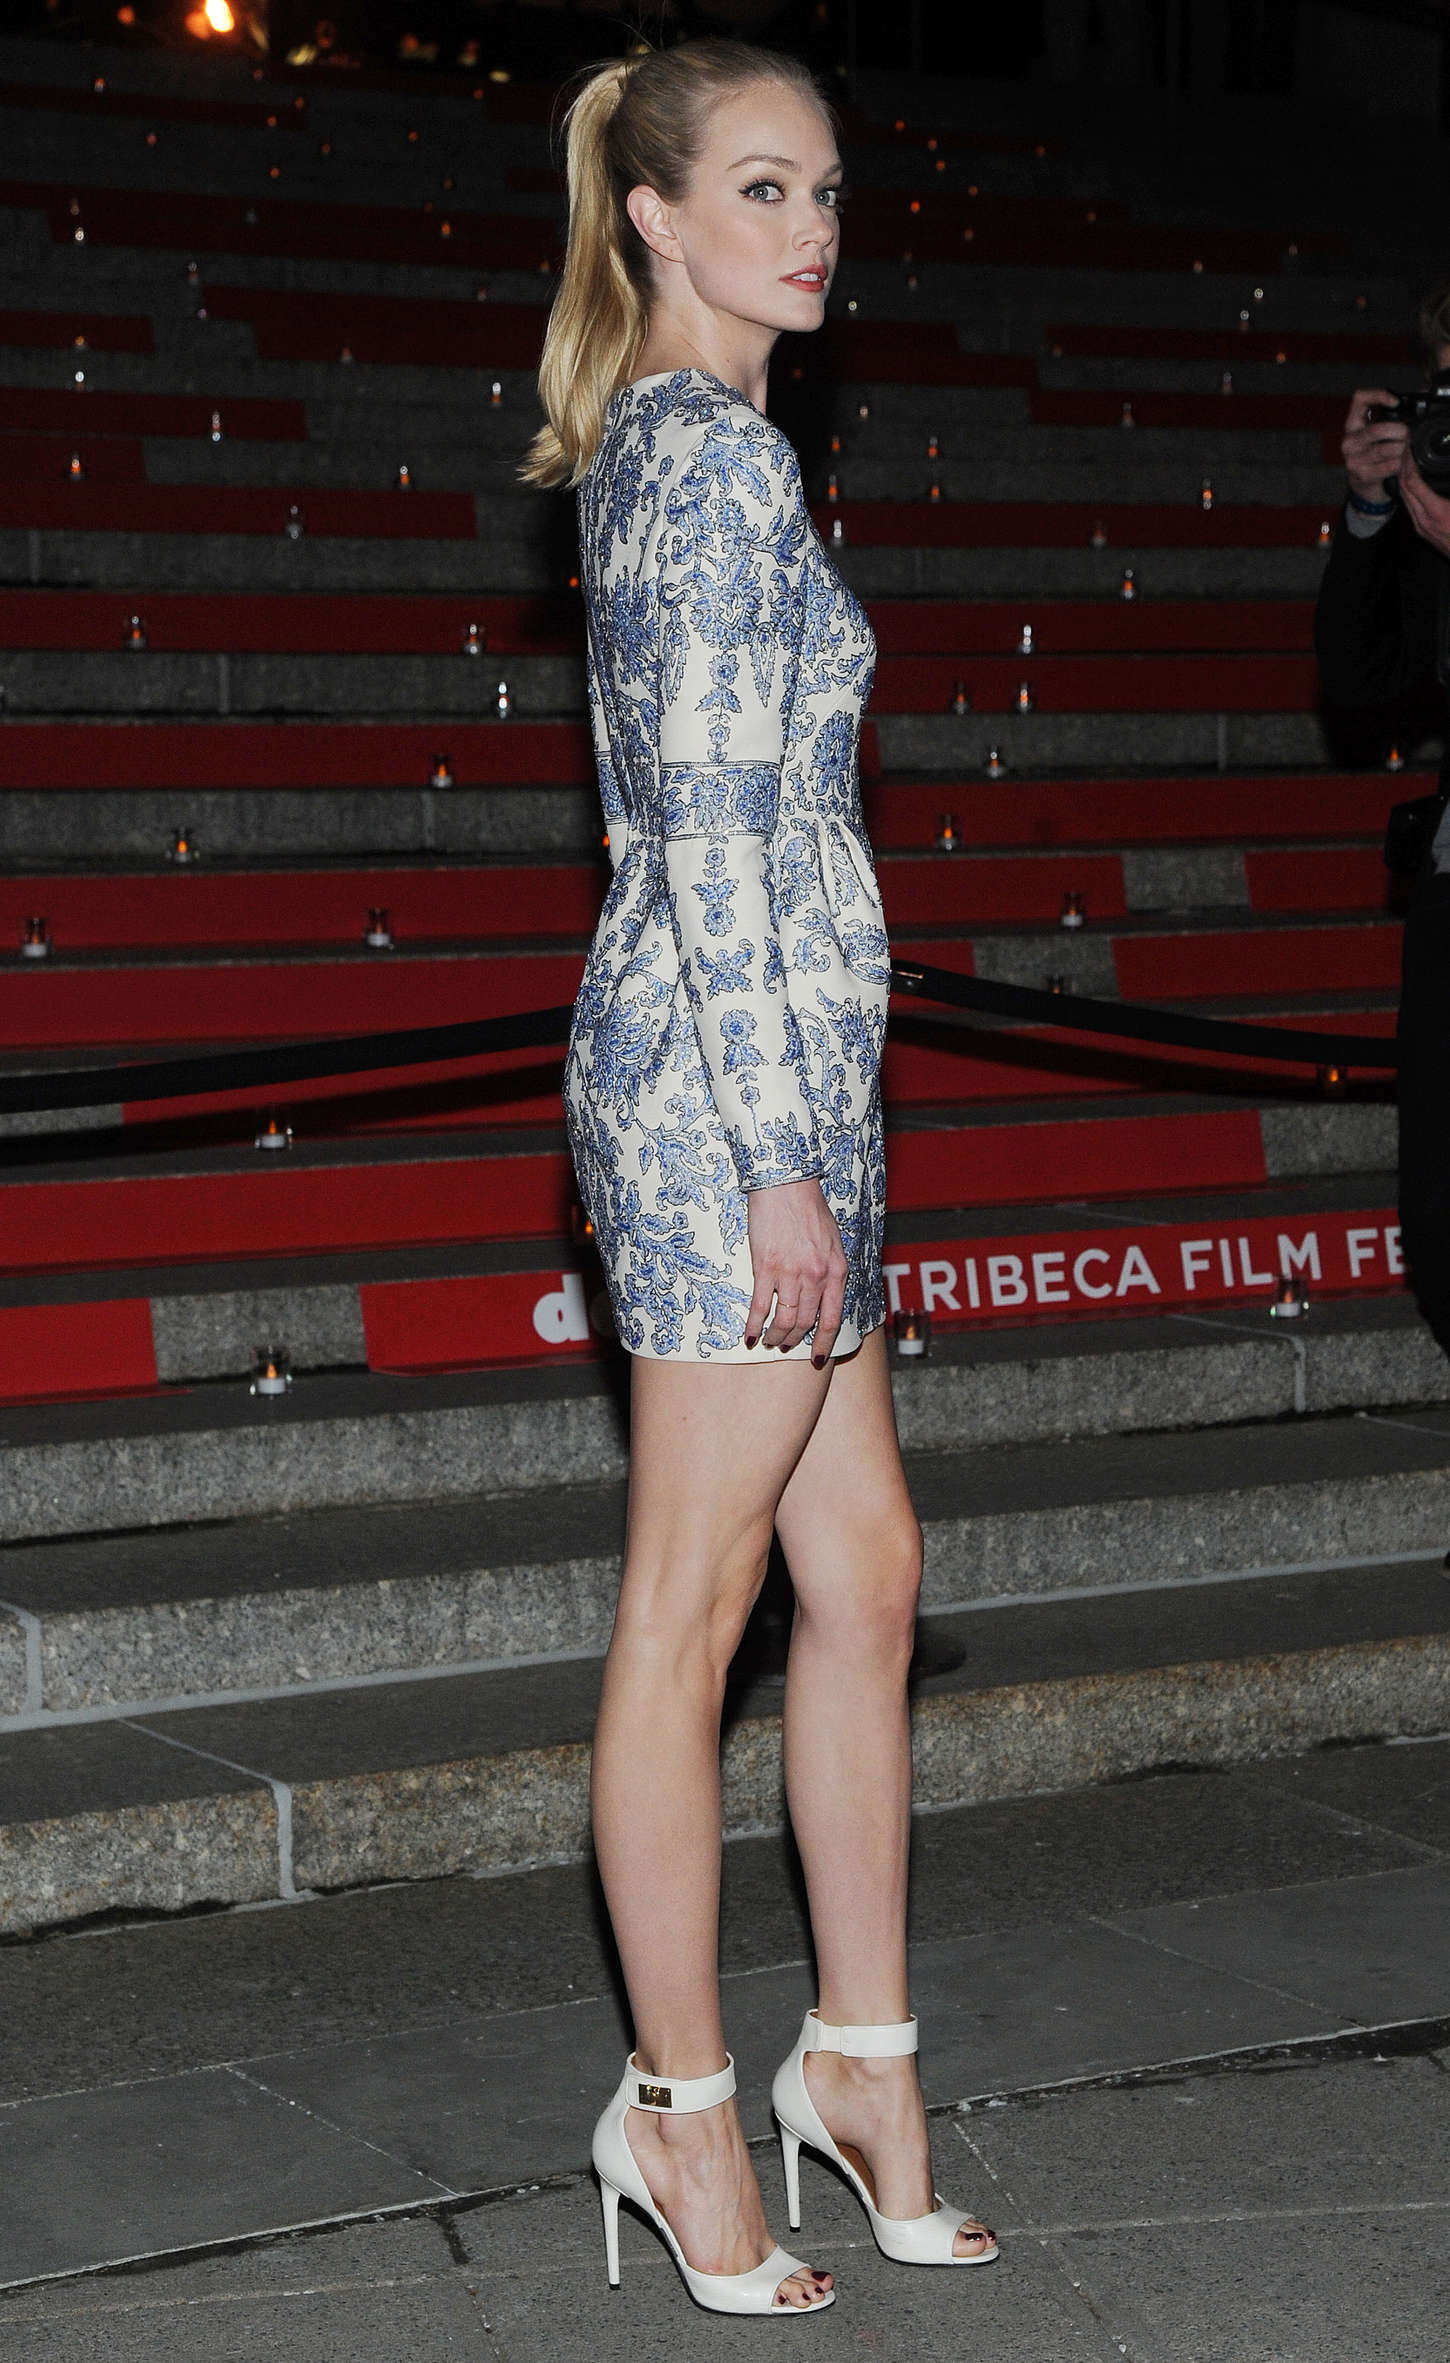 Lindsay Ellingson 2015 : Lindsay Ellingson: Vanity Fair Party 2015 Tribeca Film Festival -02